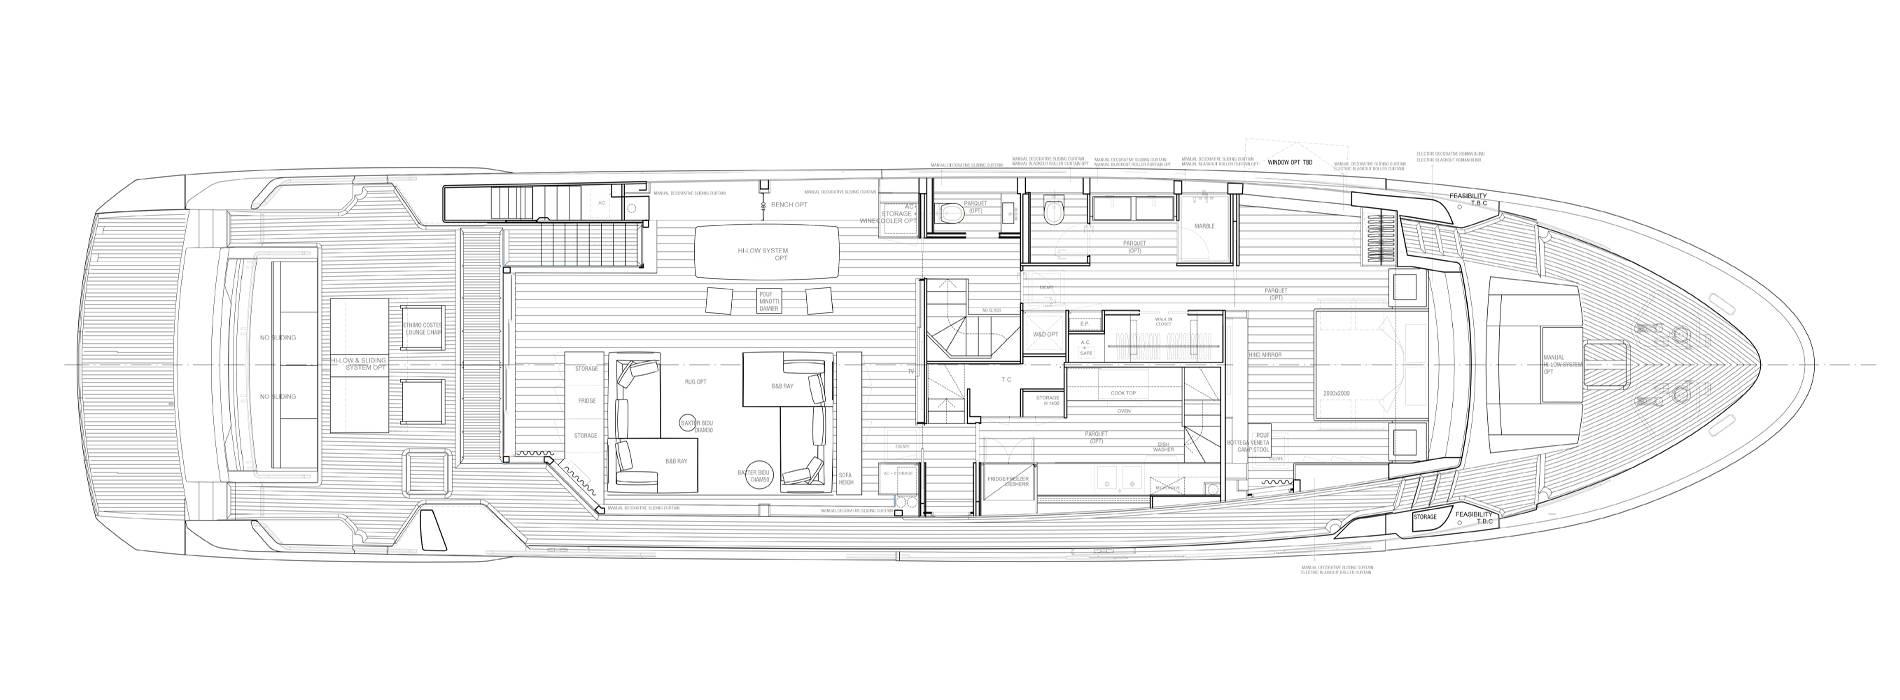 Sanlorenzo Yachts SL102A-746 under offer Cubierta principal